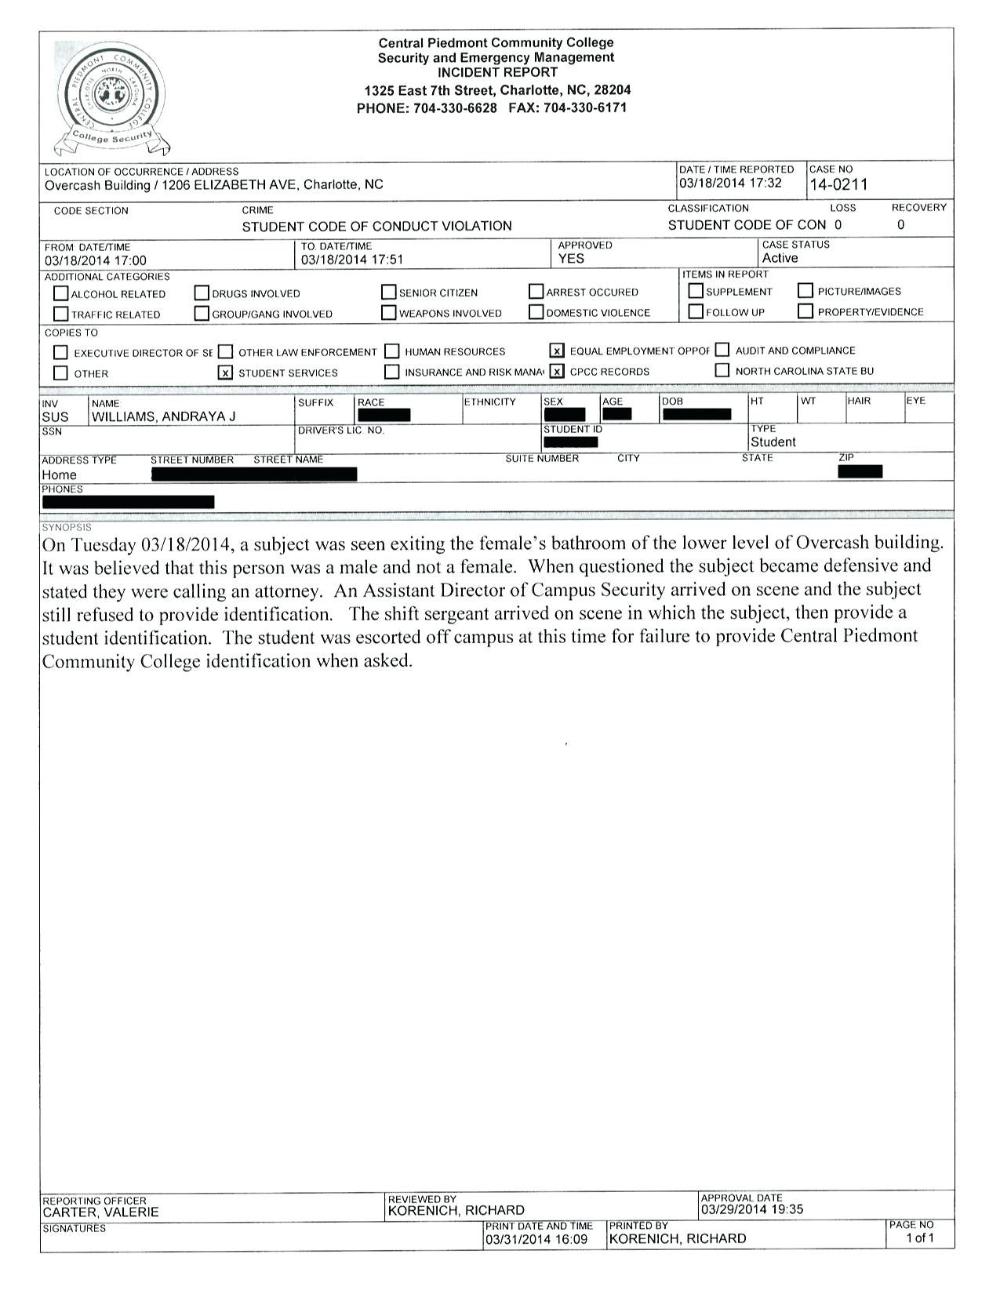 Security Incident Report Sample Template Uk Guard Pdf